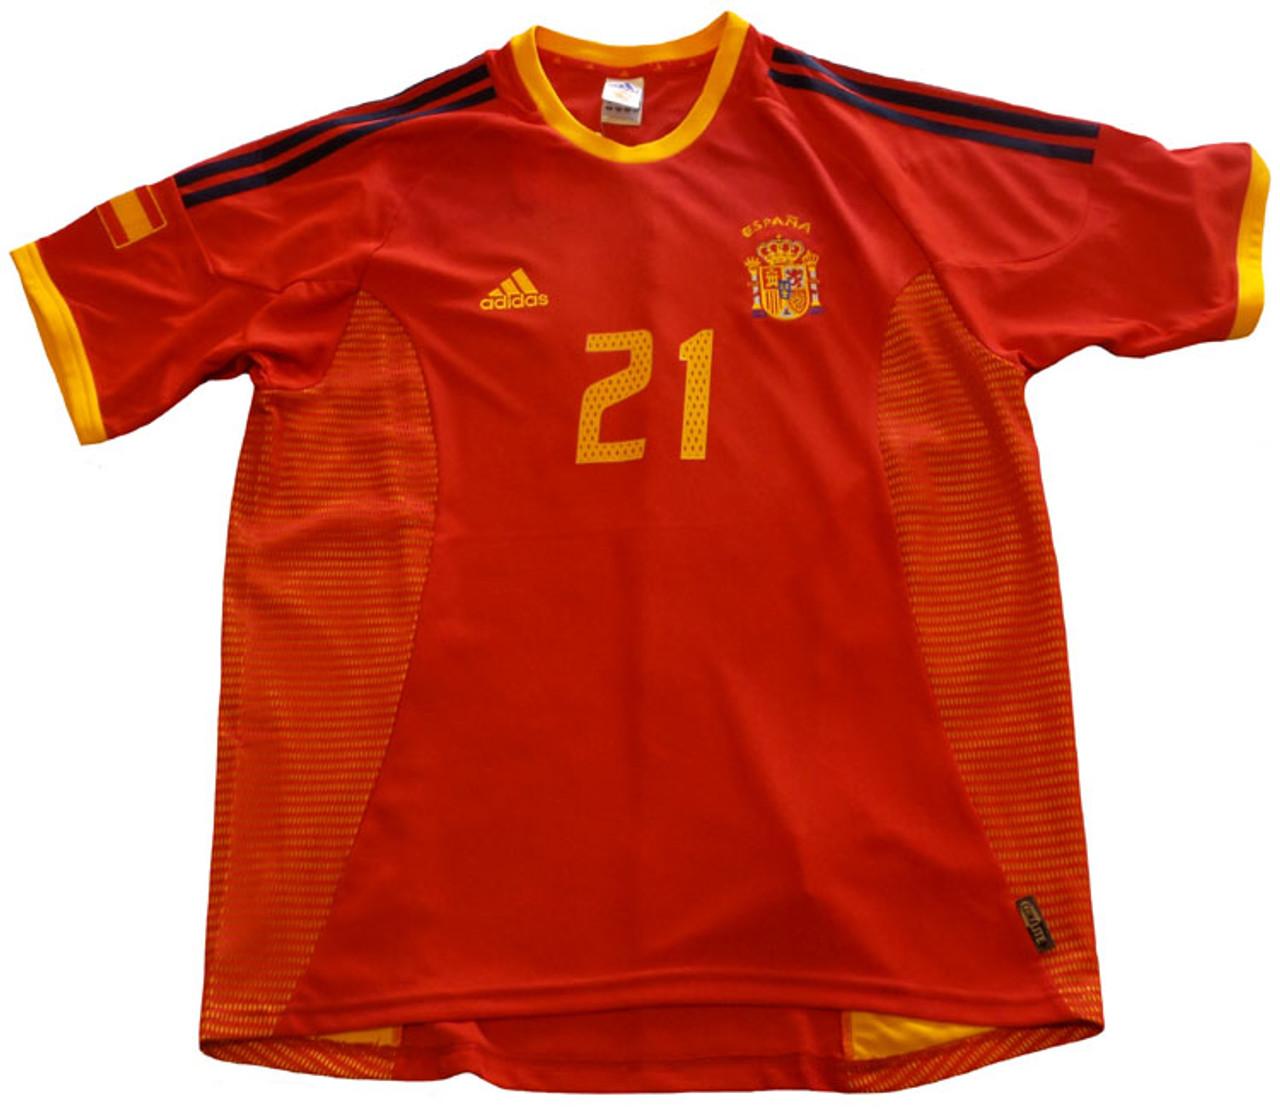 ADIDAS SPAIN 2002 `LUIS ENRIQUE` HOME JERSEY - Soccer Plus da3cee6cd